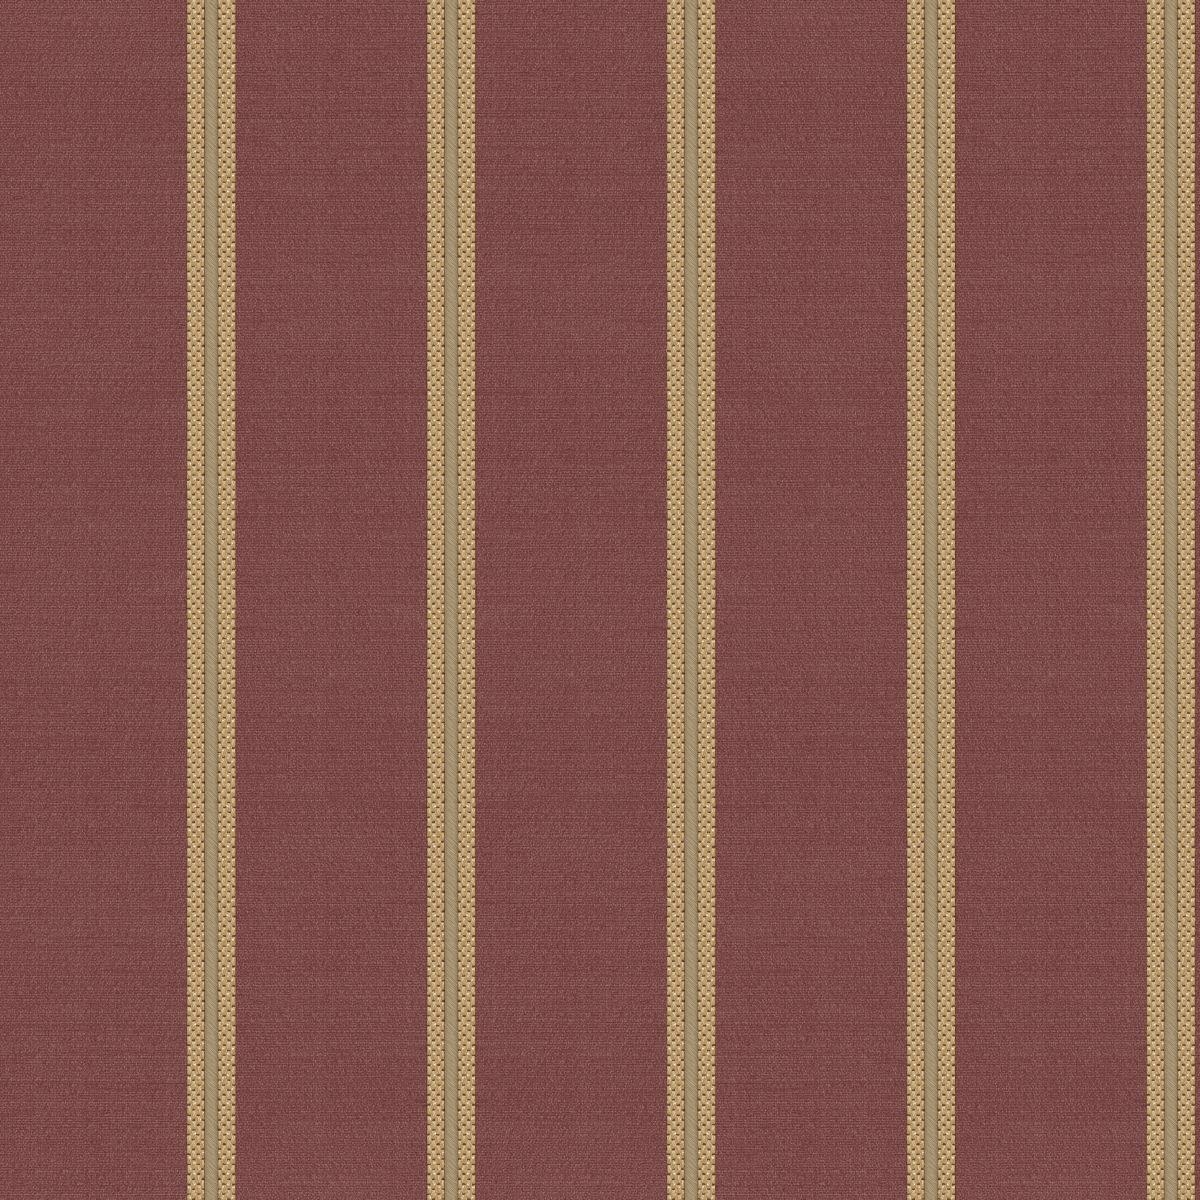 hochwertige tapeten und stoffe vinyltapete parato cristina masi vintage 3968 decowunder. Black Bedroom Furniture Sets. Home Design Ideas